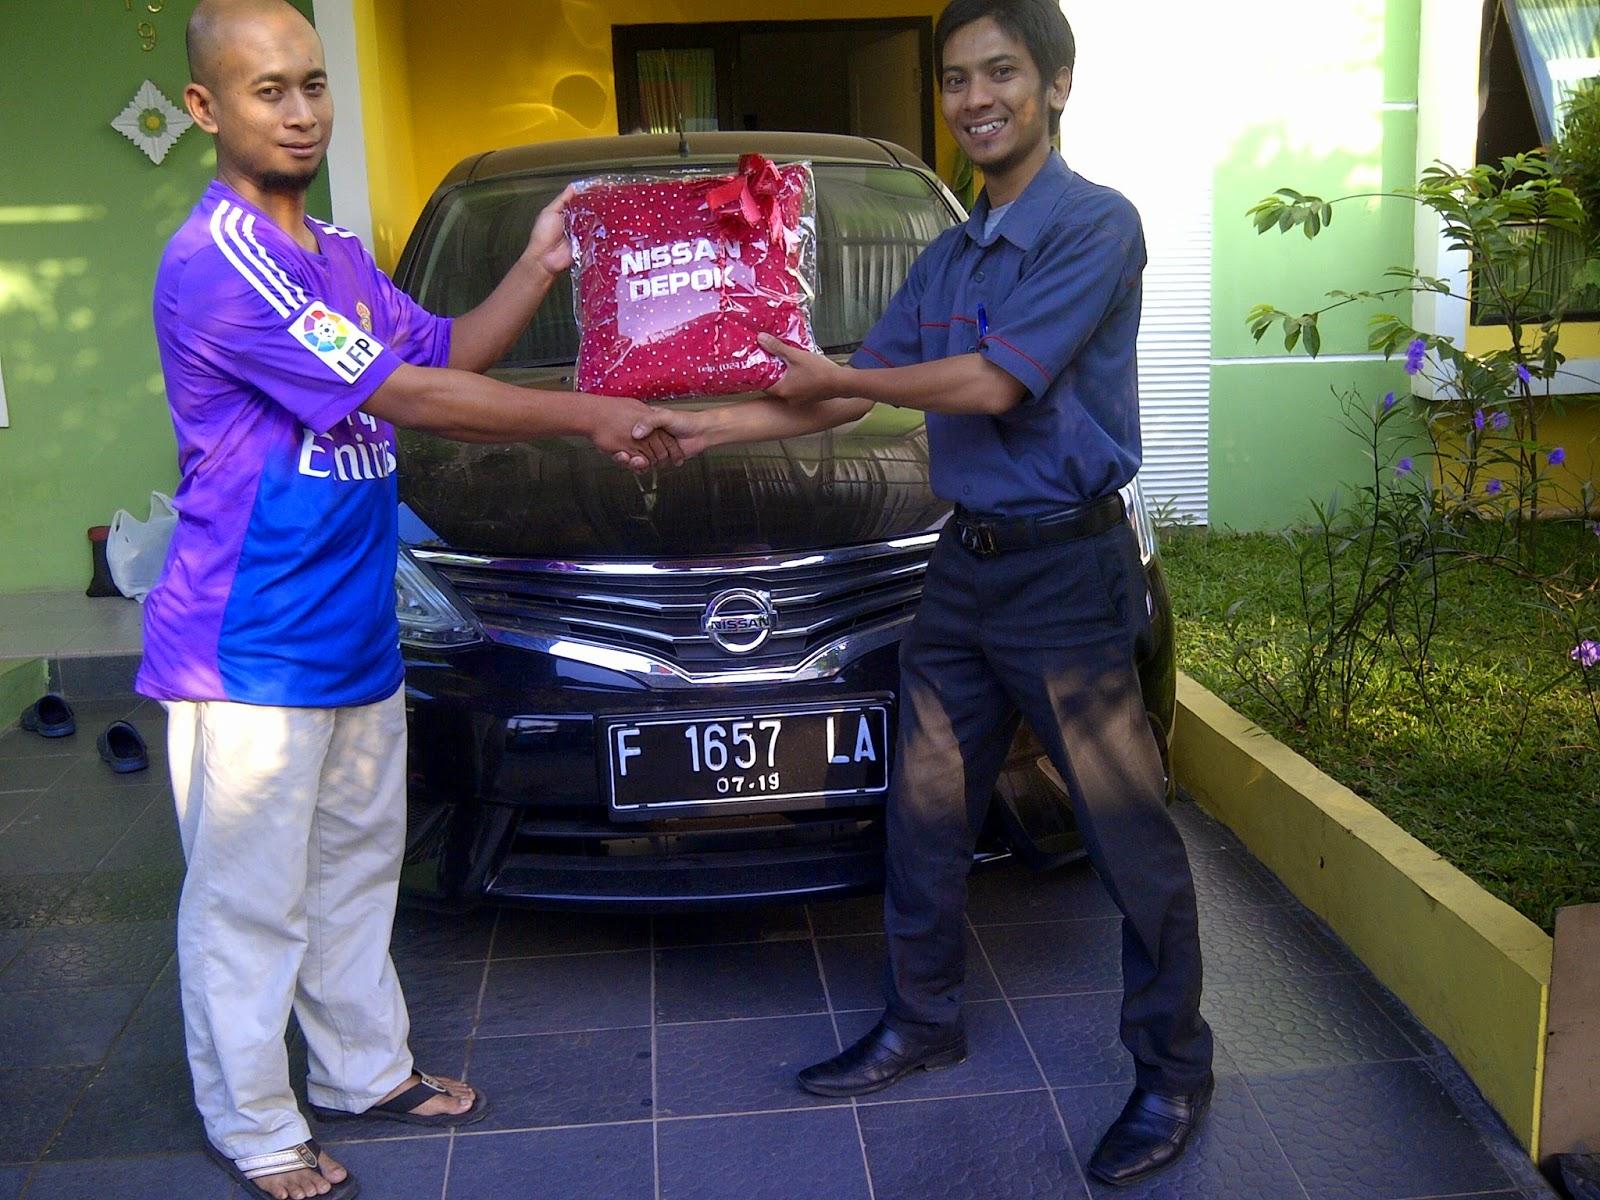 Terimakasih atas kepercayaan Pak Supriyanto yg telah membeli Grand Livina melalui media www.touchnissan.com.  Semoga Berkah ya Pak...